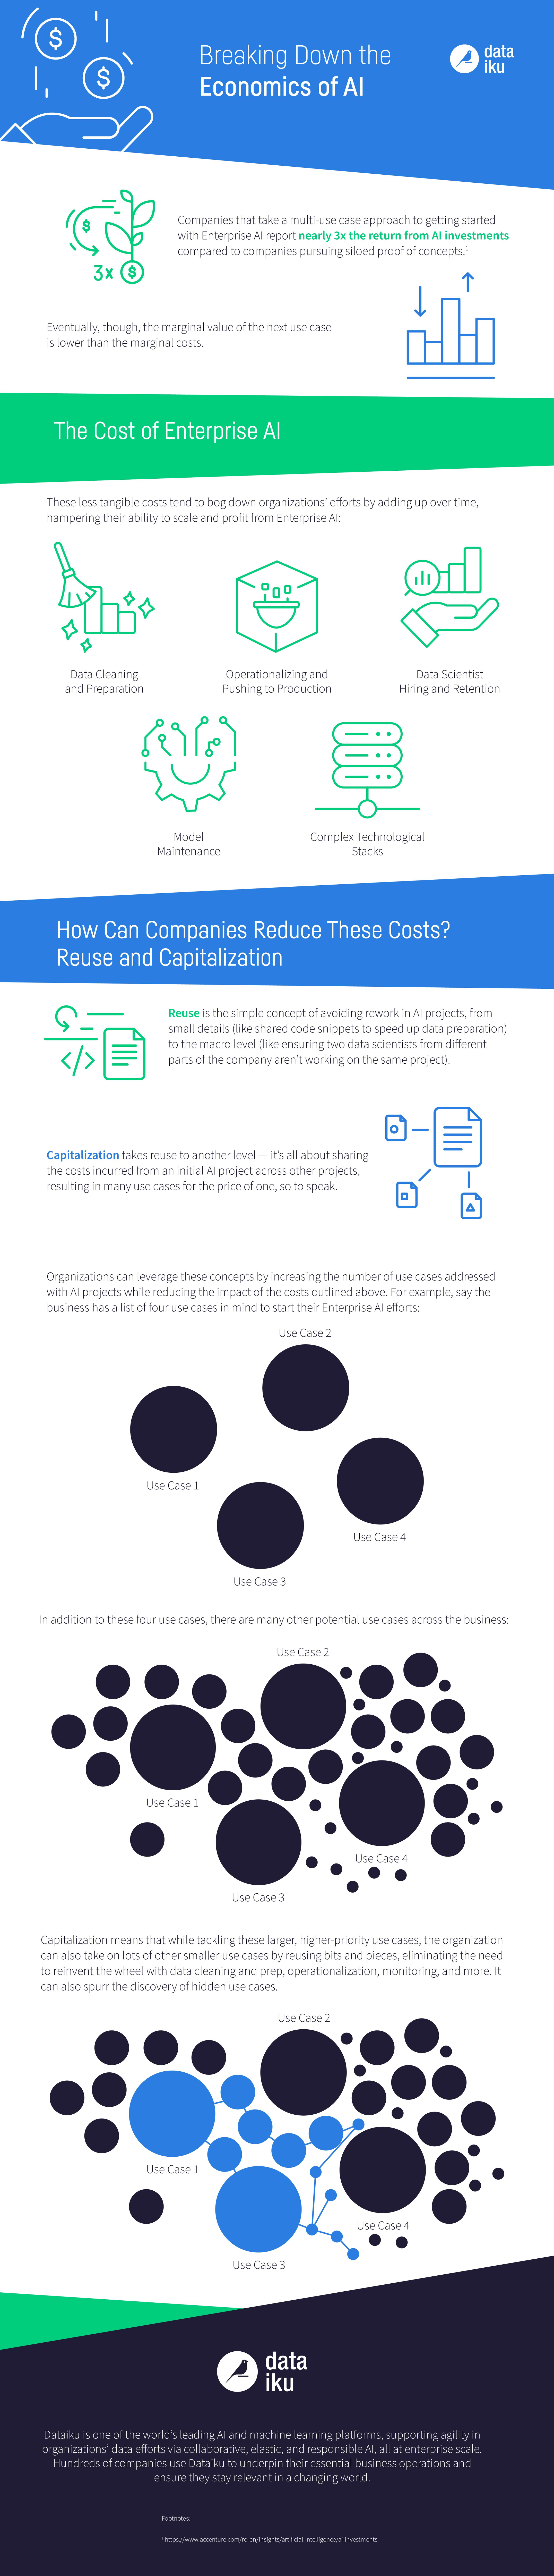 DAT_Economics of AI - Infographic@3x